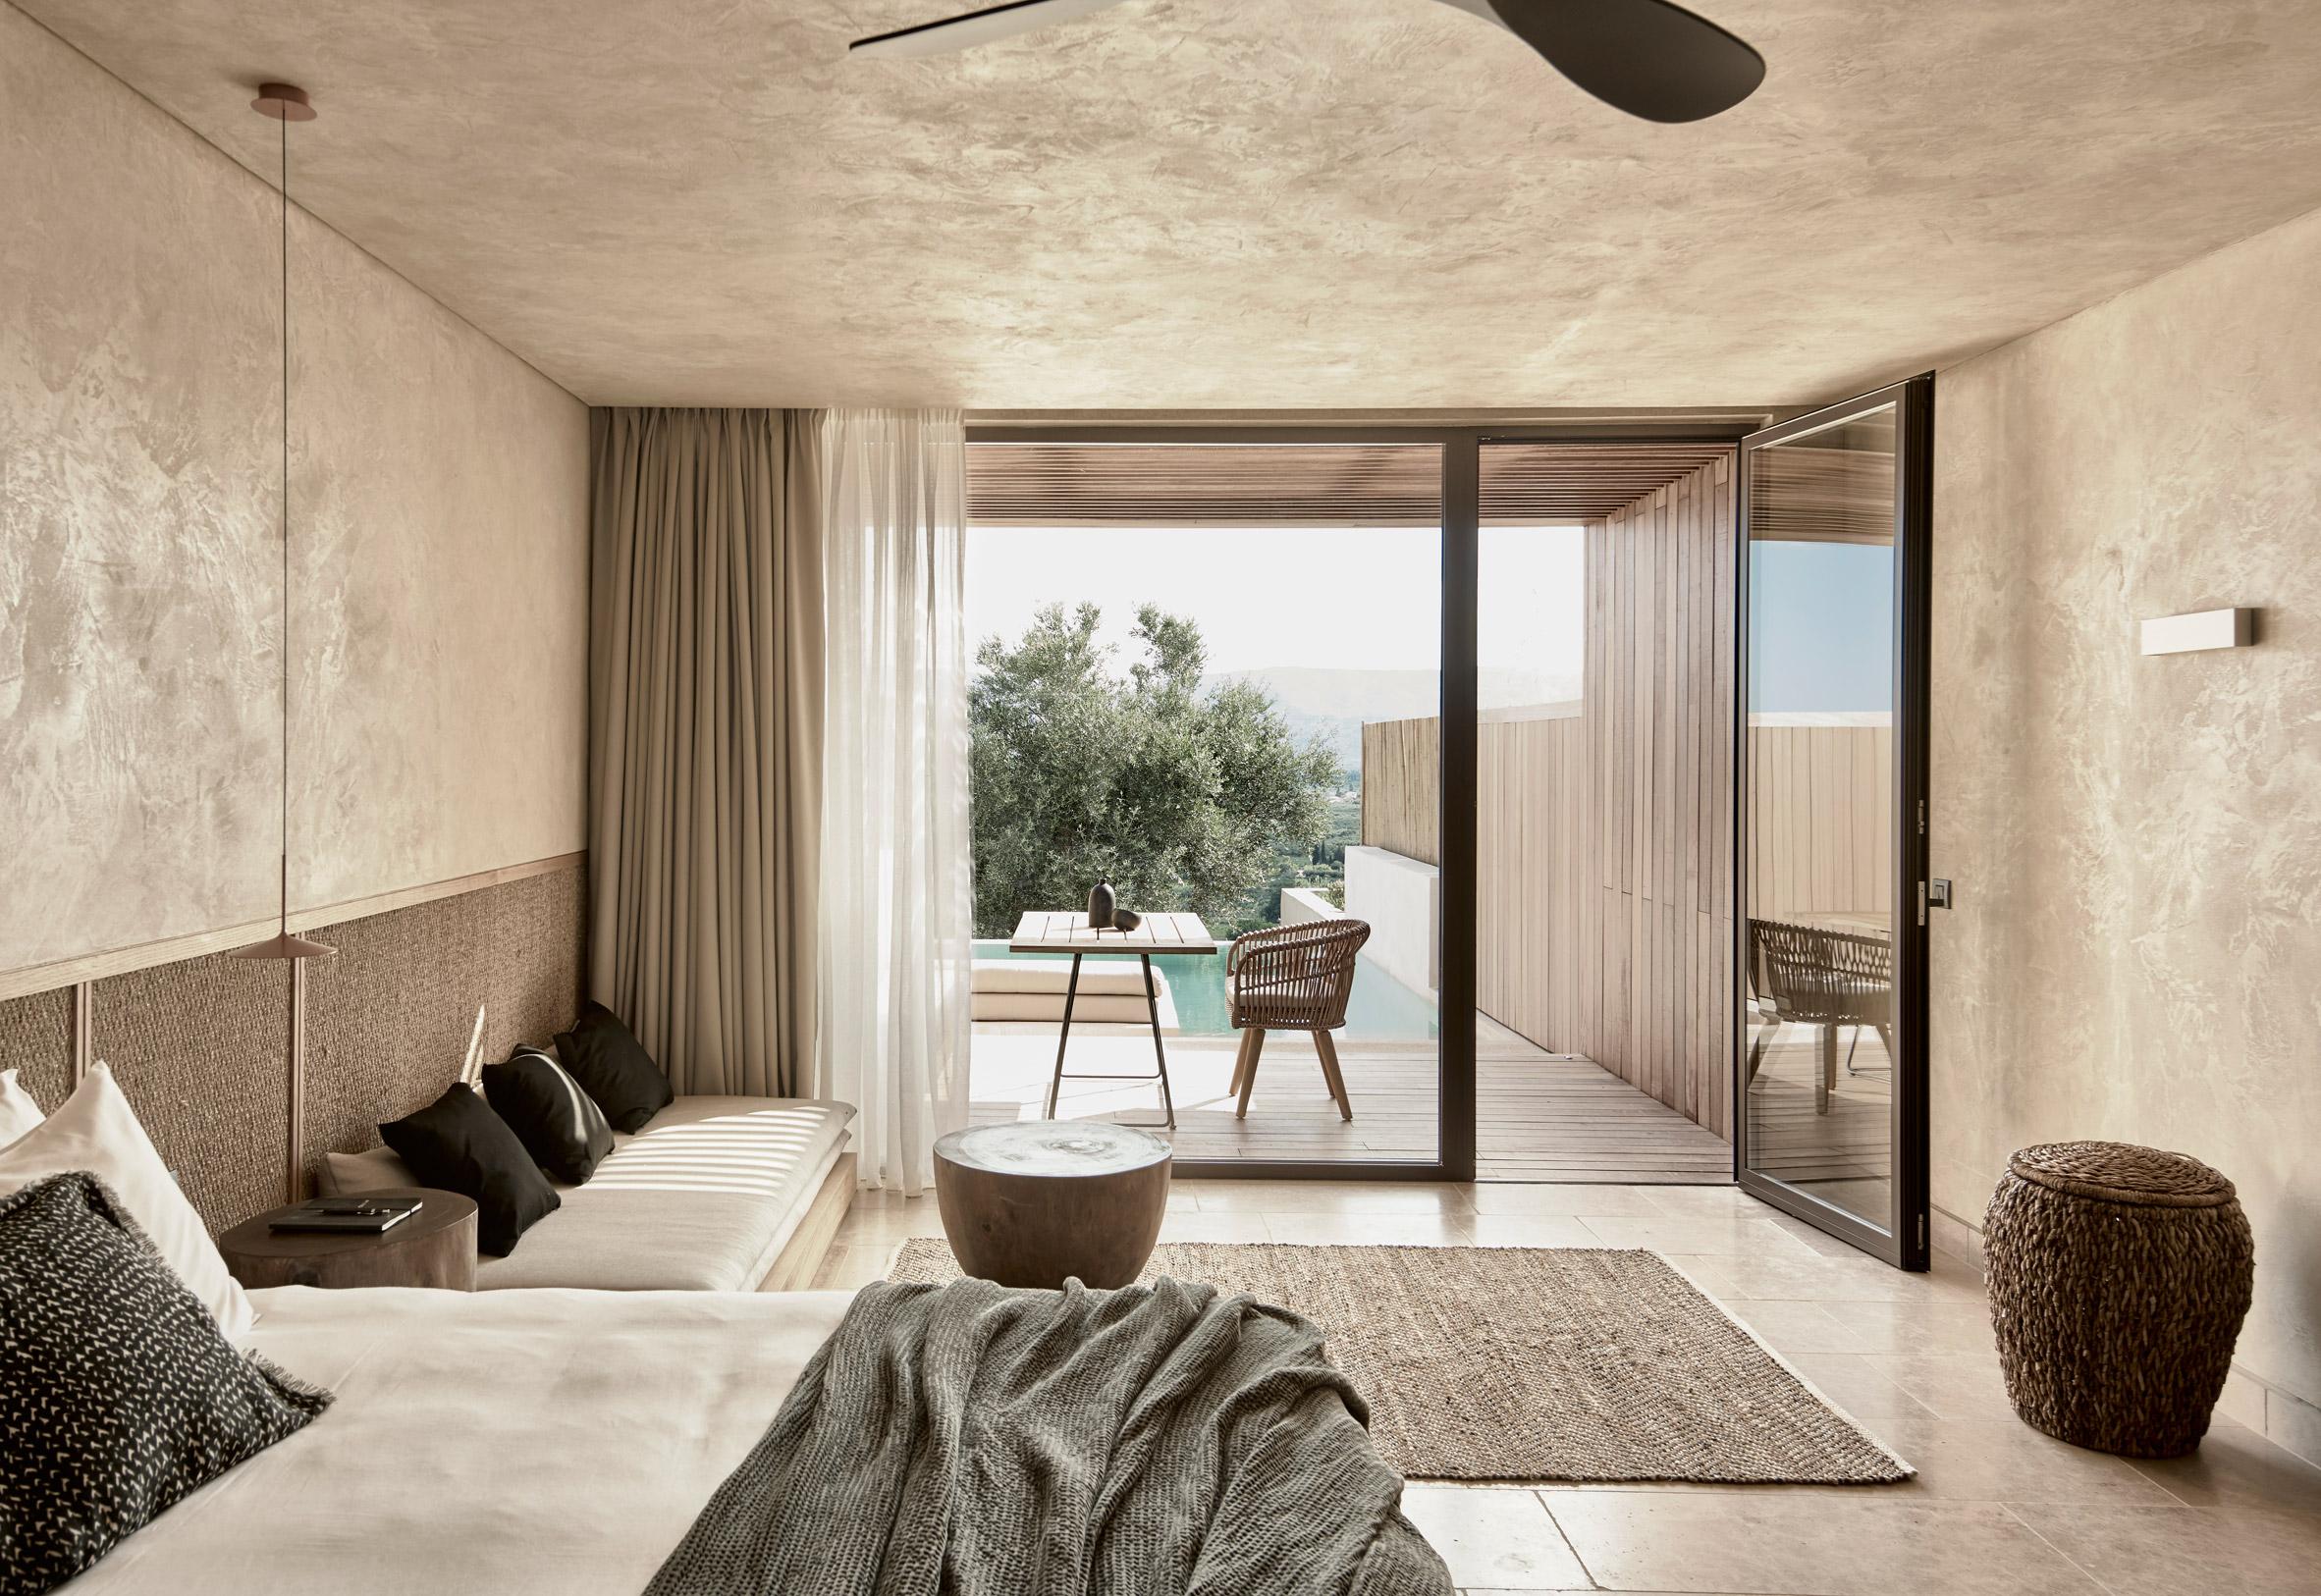 nội thất khách sạn olea-hotel-block722-elledecorationvn-relaxing space2